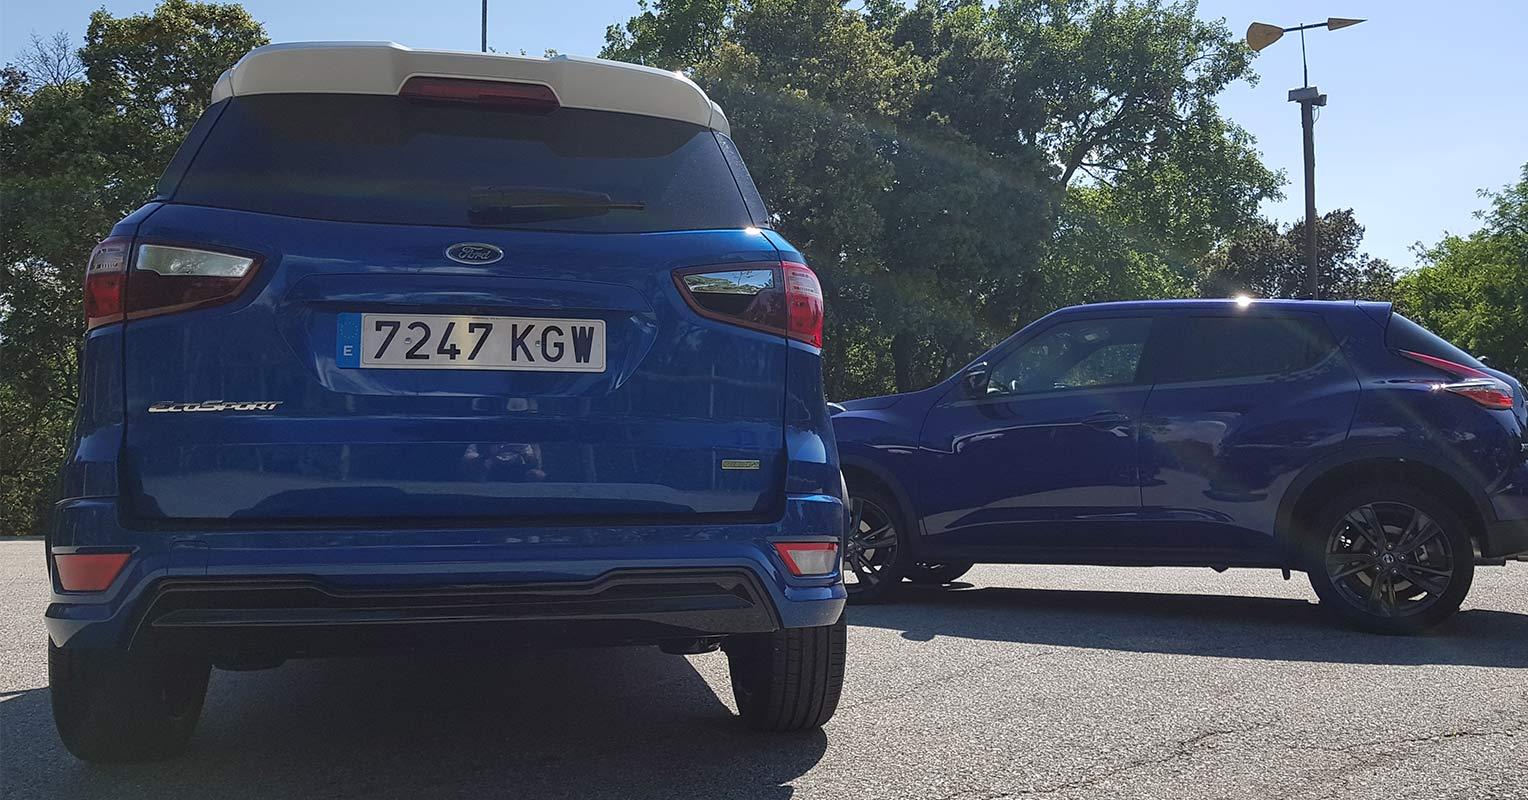 Trasera del Ford EcoSport 2018